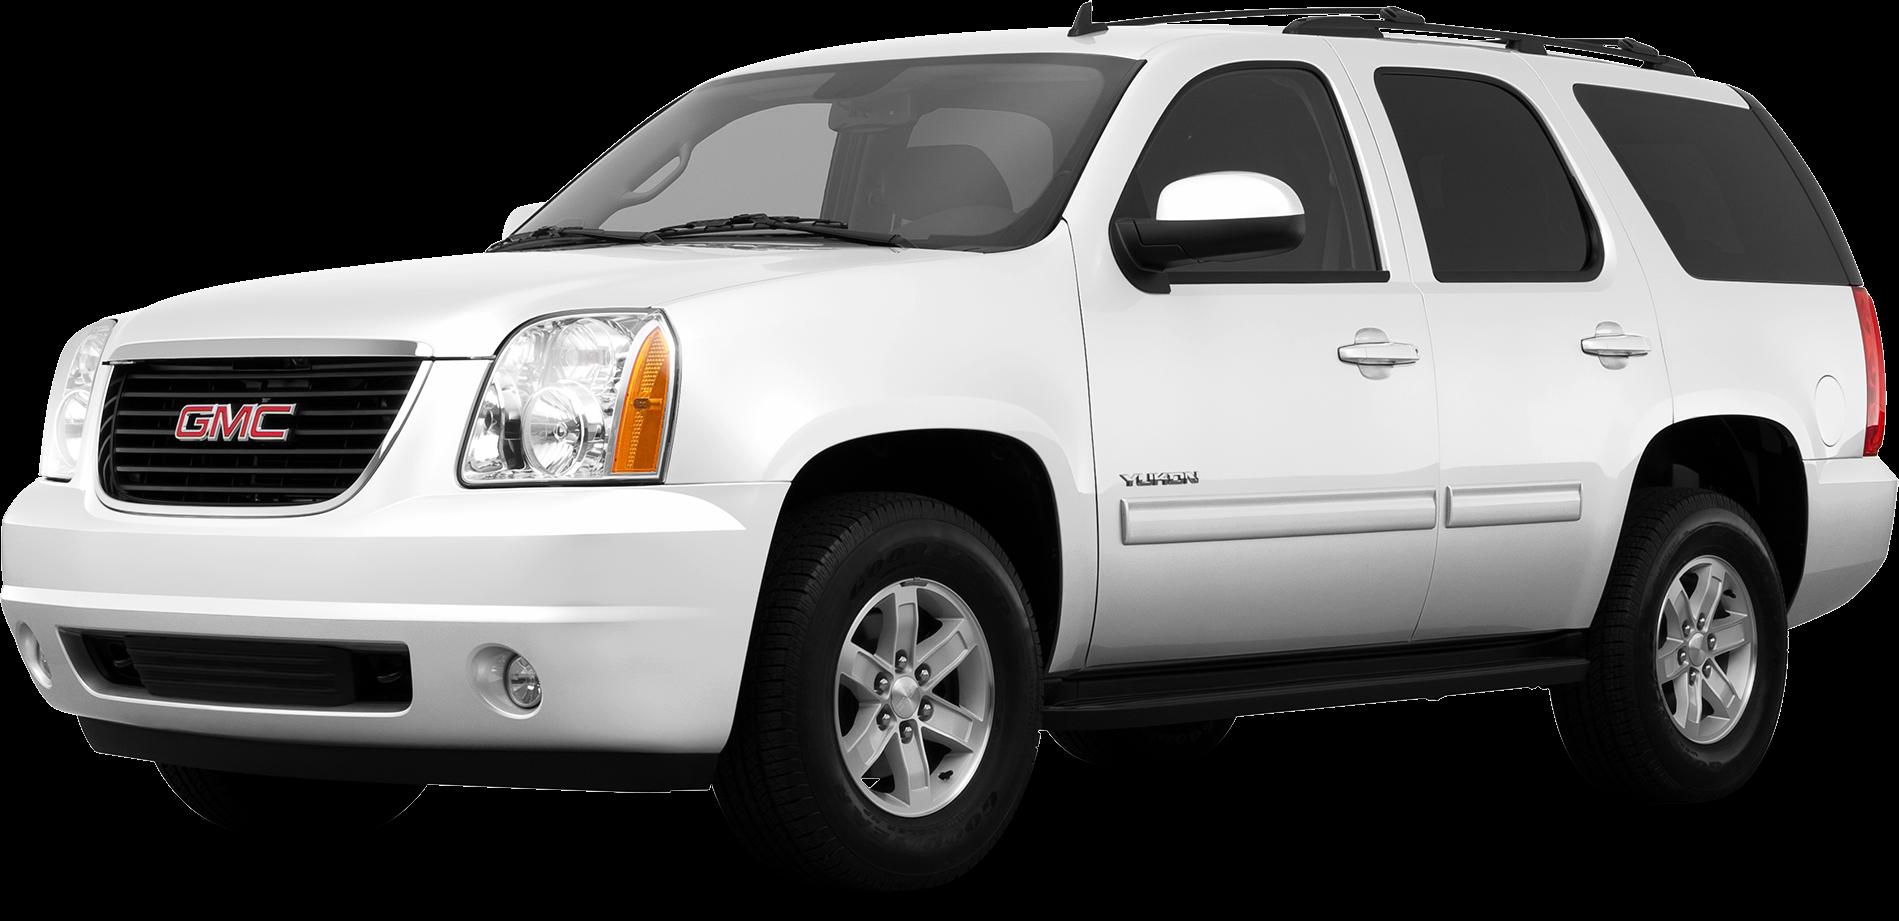 2013 Gmc Yukon Values Cars For Sale Kelley Blue Book